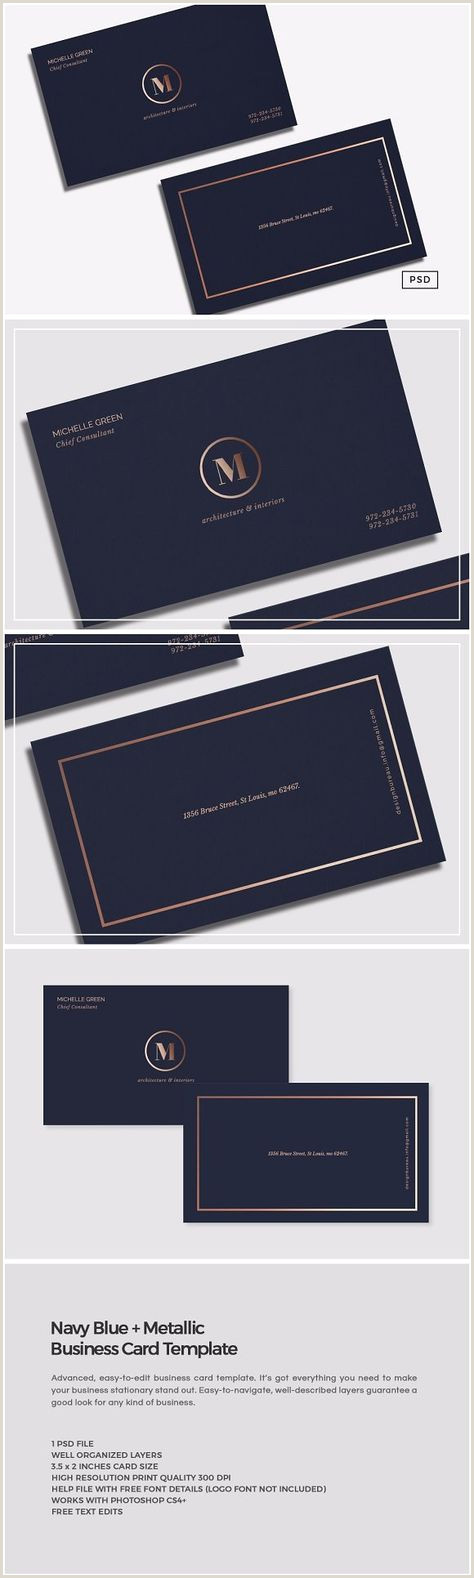 Design Unique Business Cards In Photoshop 46 Best Ideas For Photography Business Cards Design Ideas